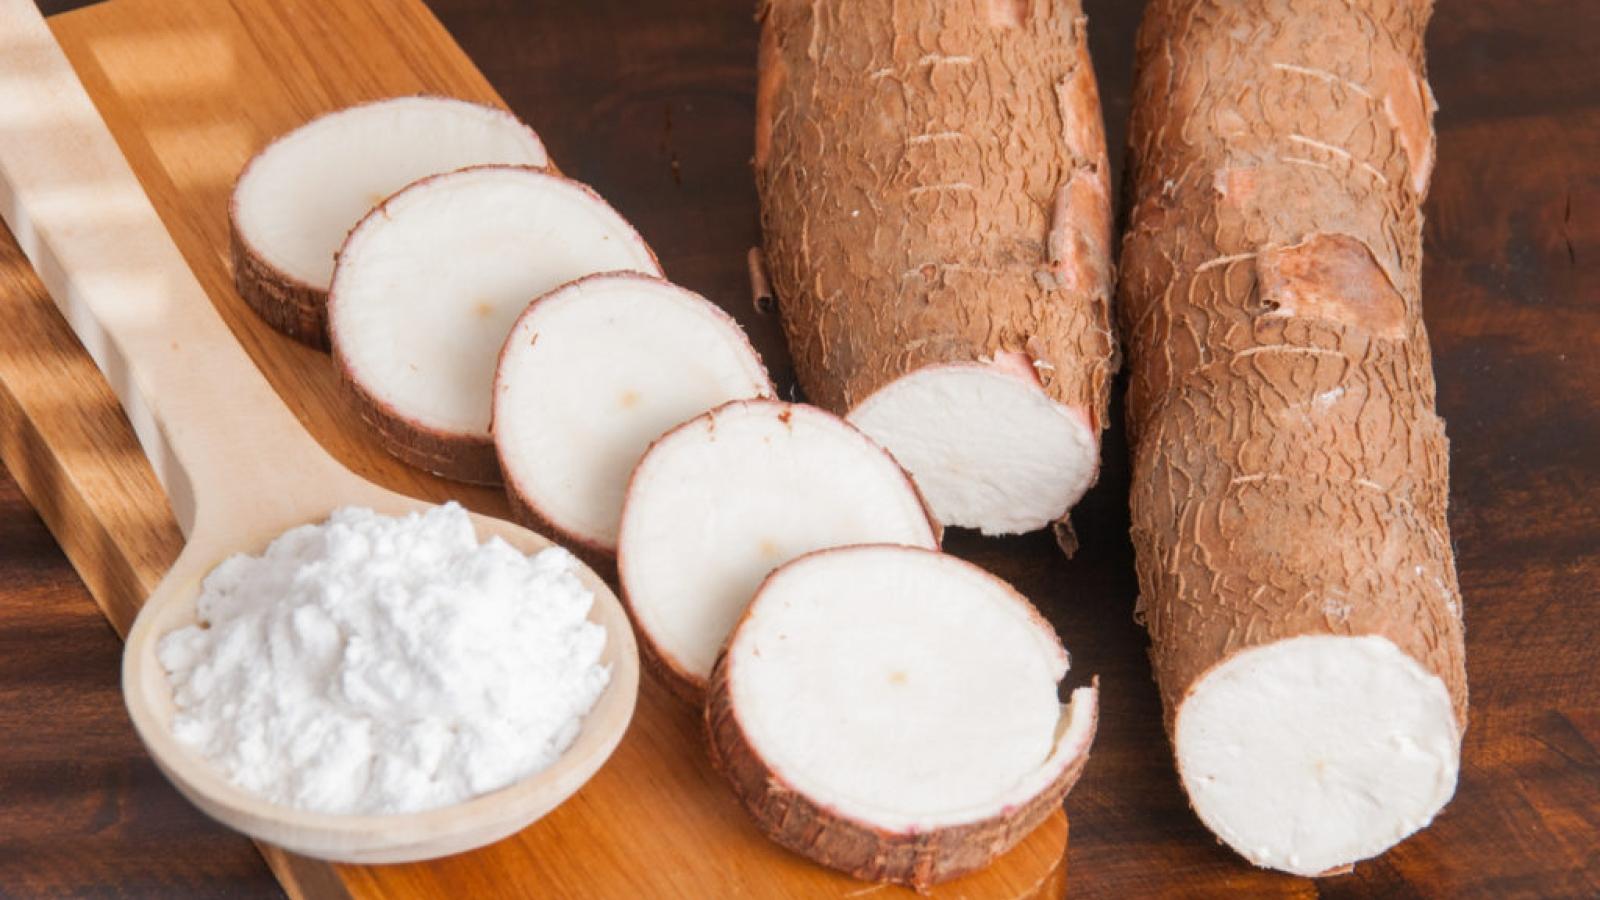 Cassava exports enjoy 12.1% surge over nine months